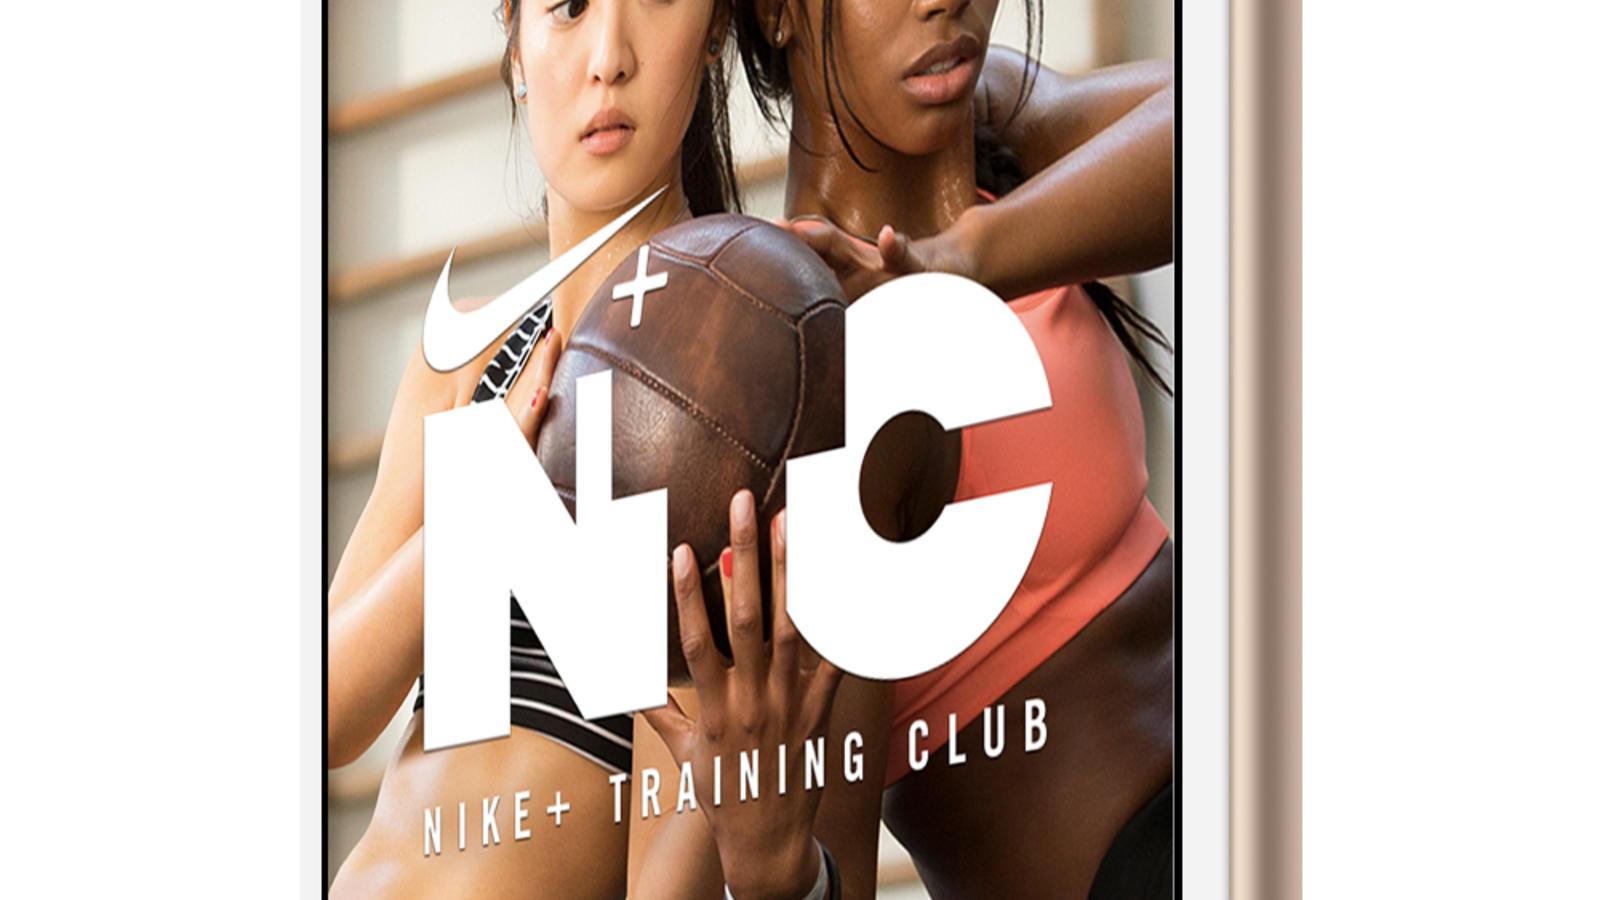 Nike+ Training Club Home Screen